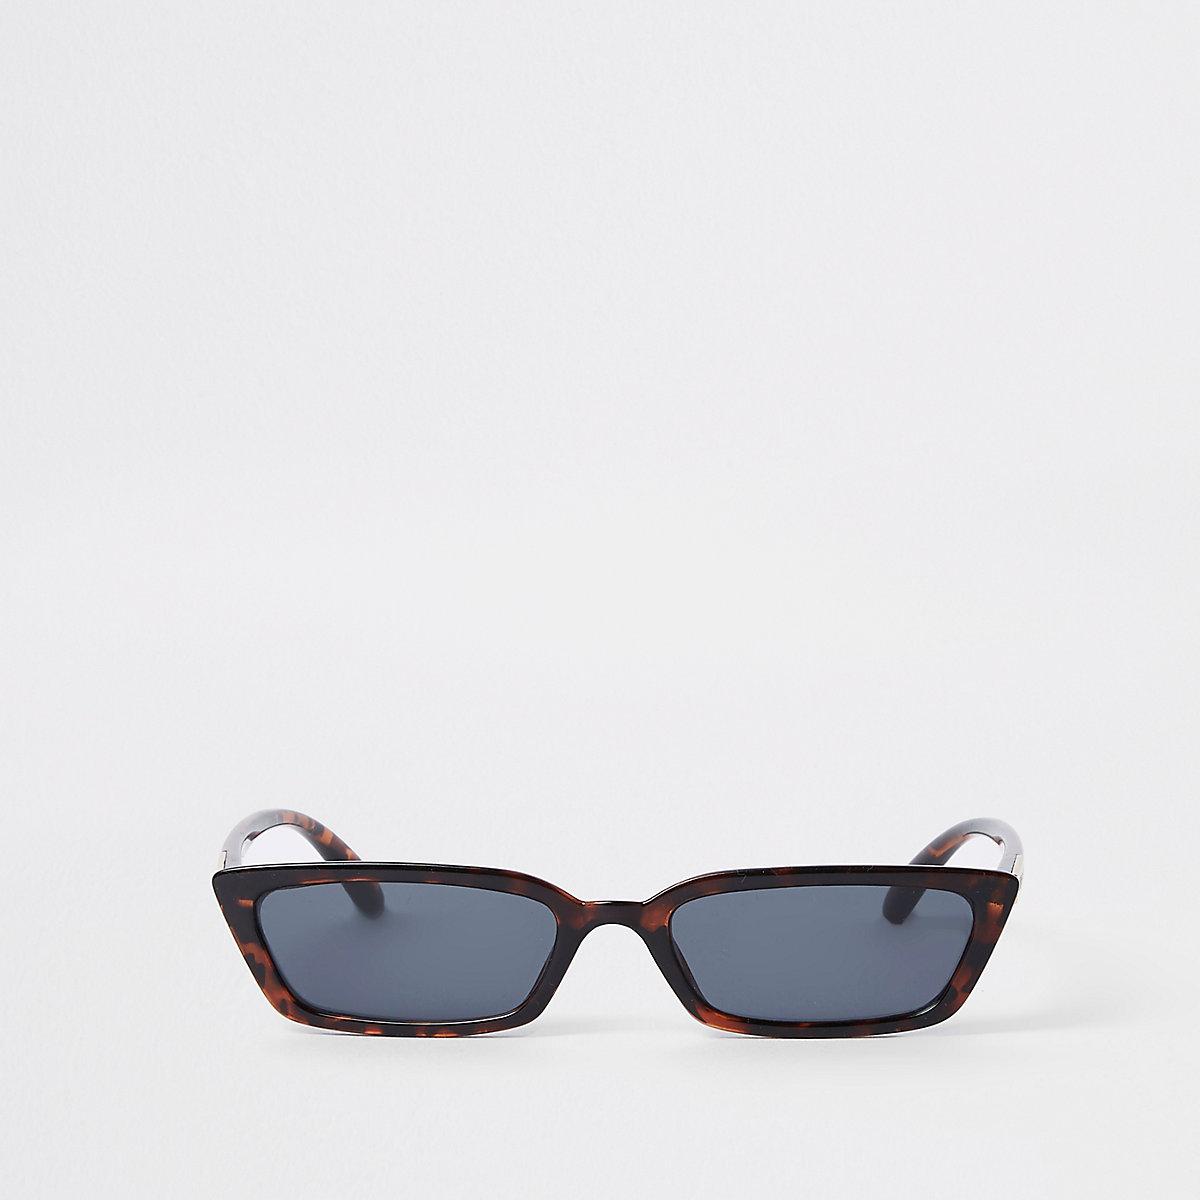 Brown tortoiseshell slim frame sunglasses